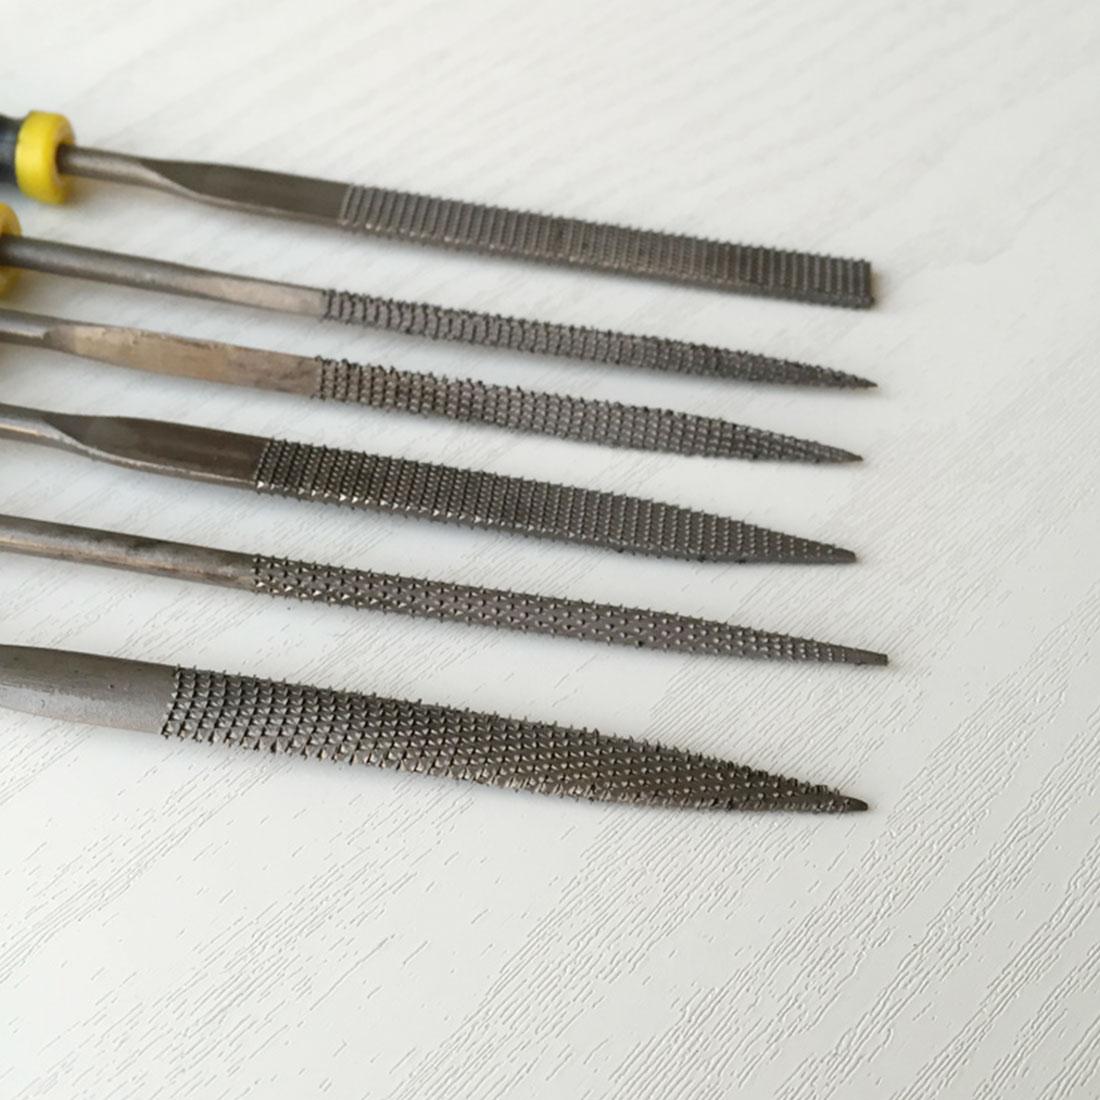 6Pcs Metal File Mini Assorted Rasp Diamond Needle File Repair Tool Set QK